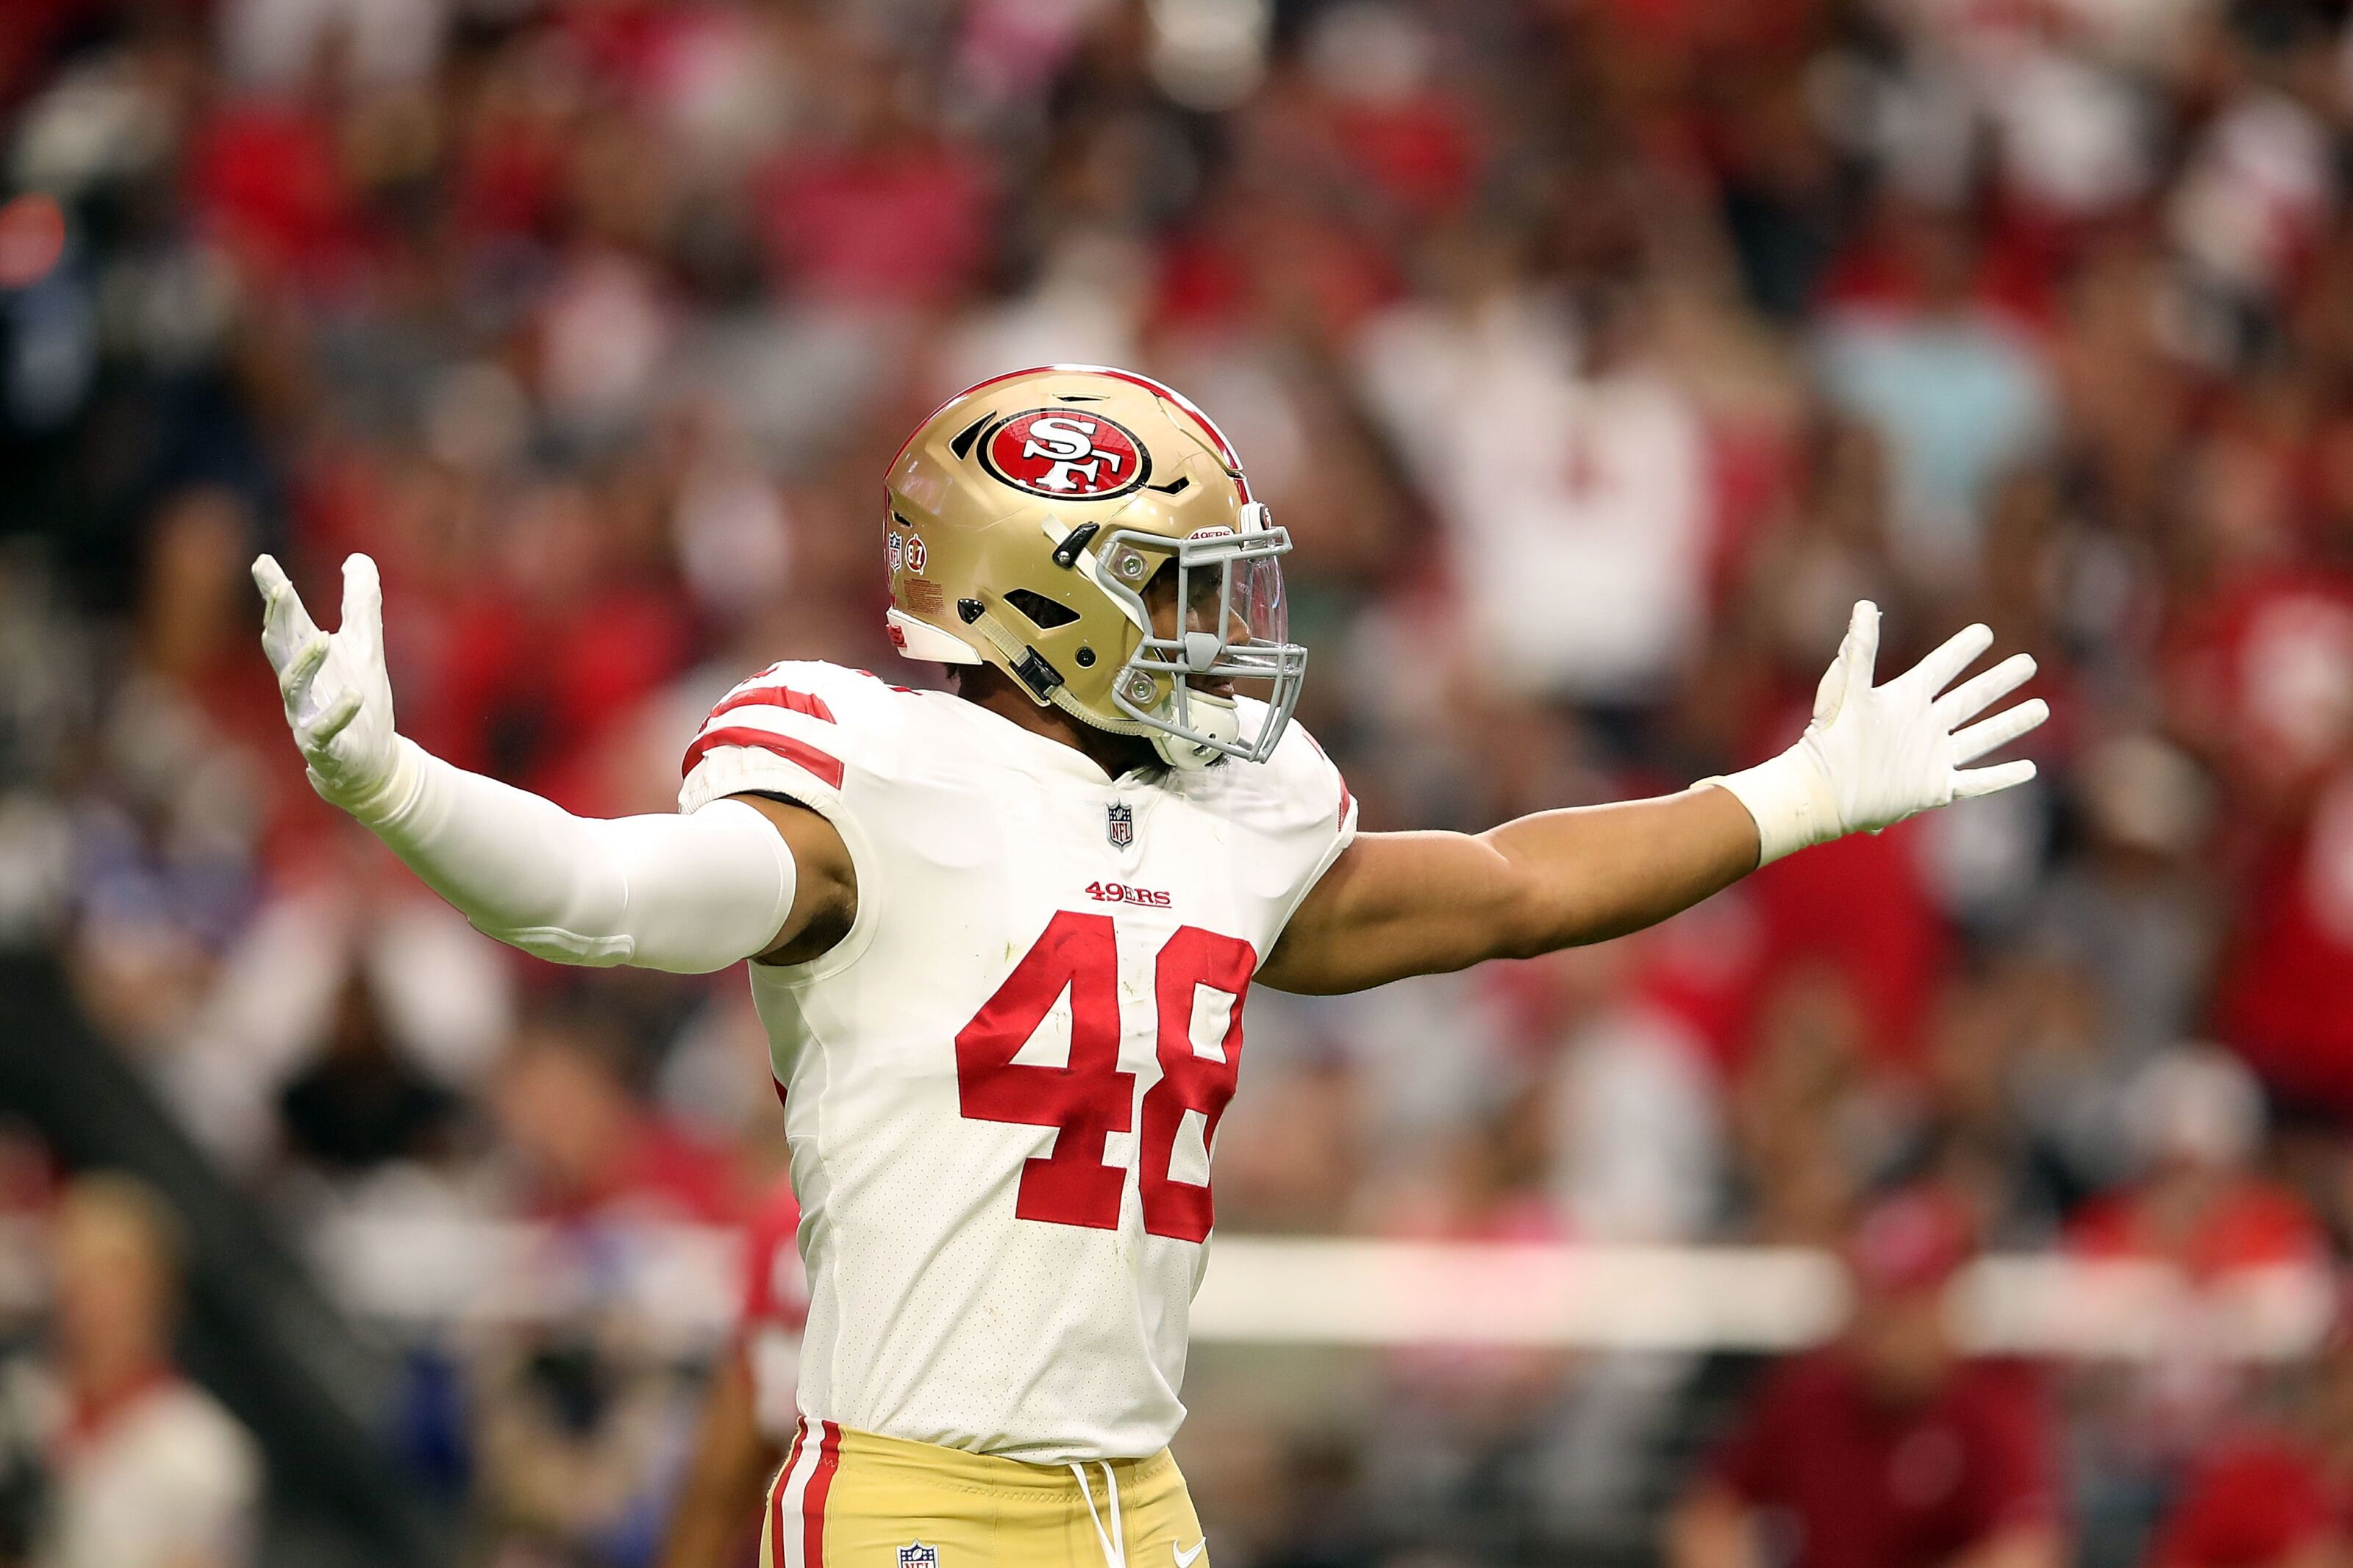 Sophomore slump candidates for the 2019 NFL season